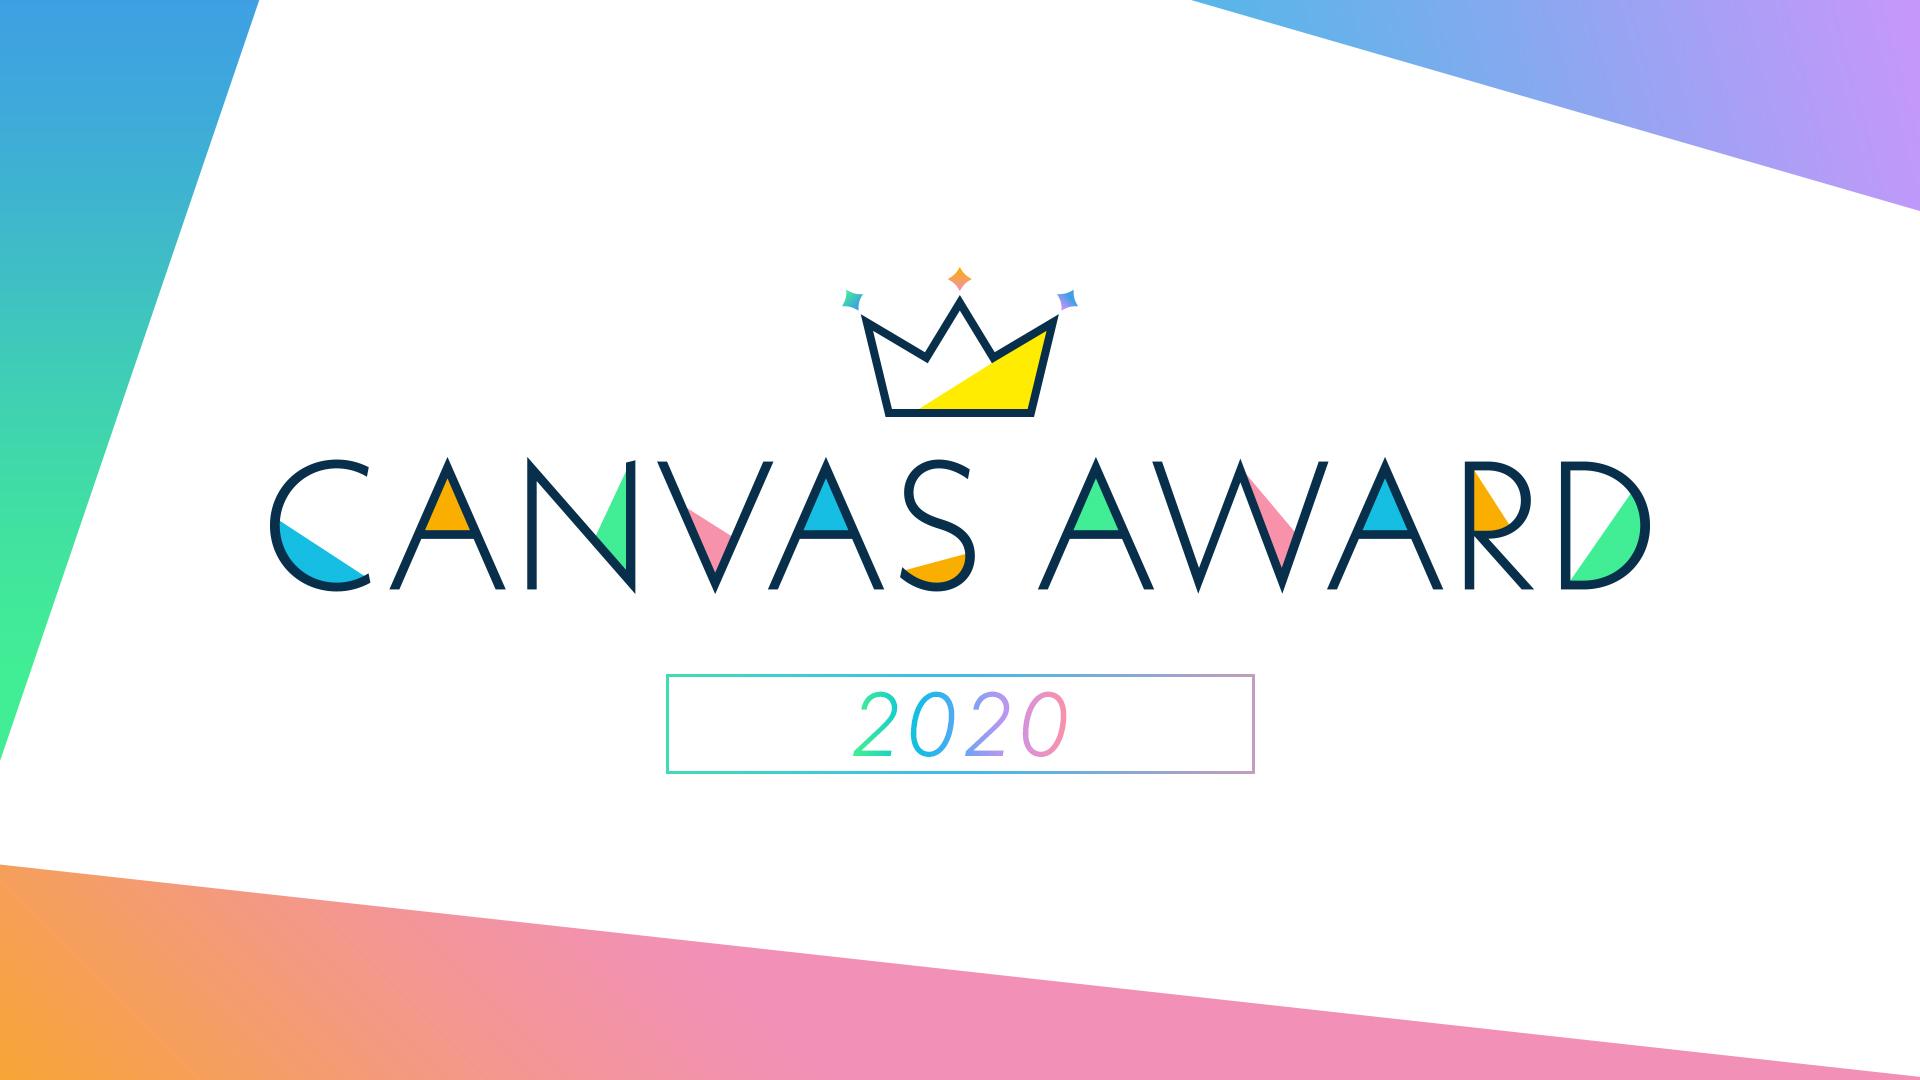 『CANVAS AWARD 2020』受賞のライターと記事を一挙ご紹介!